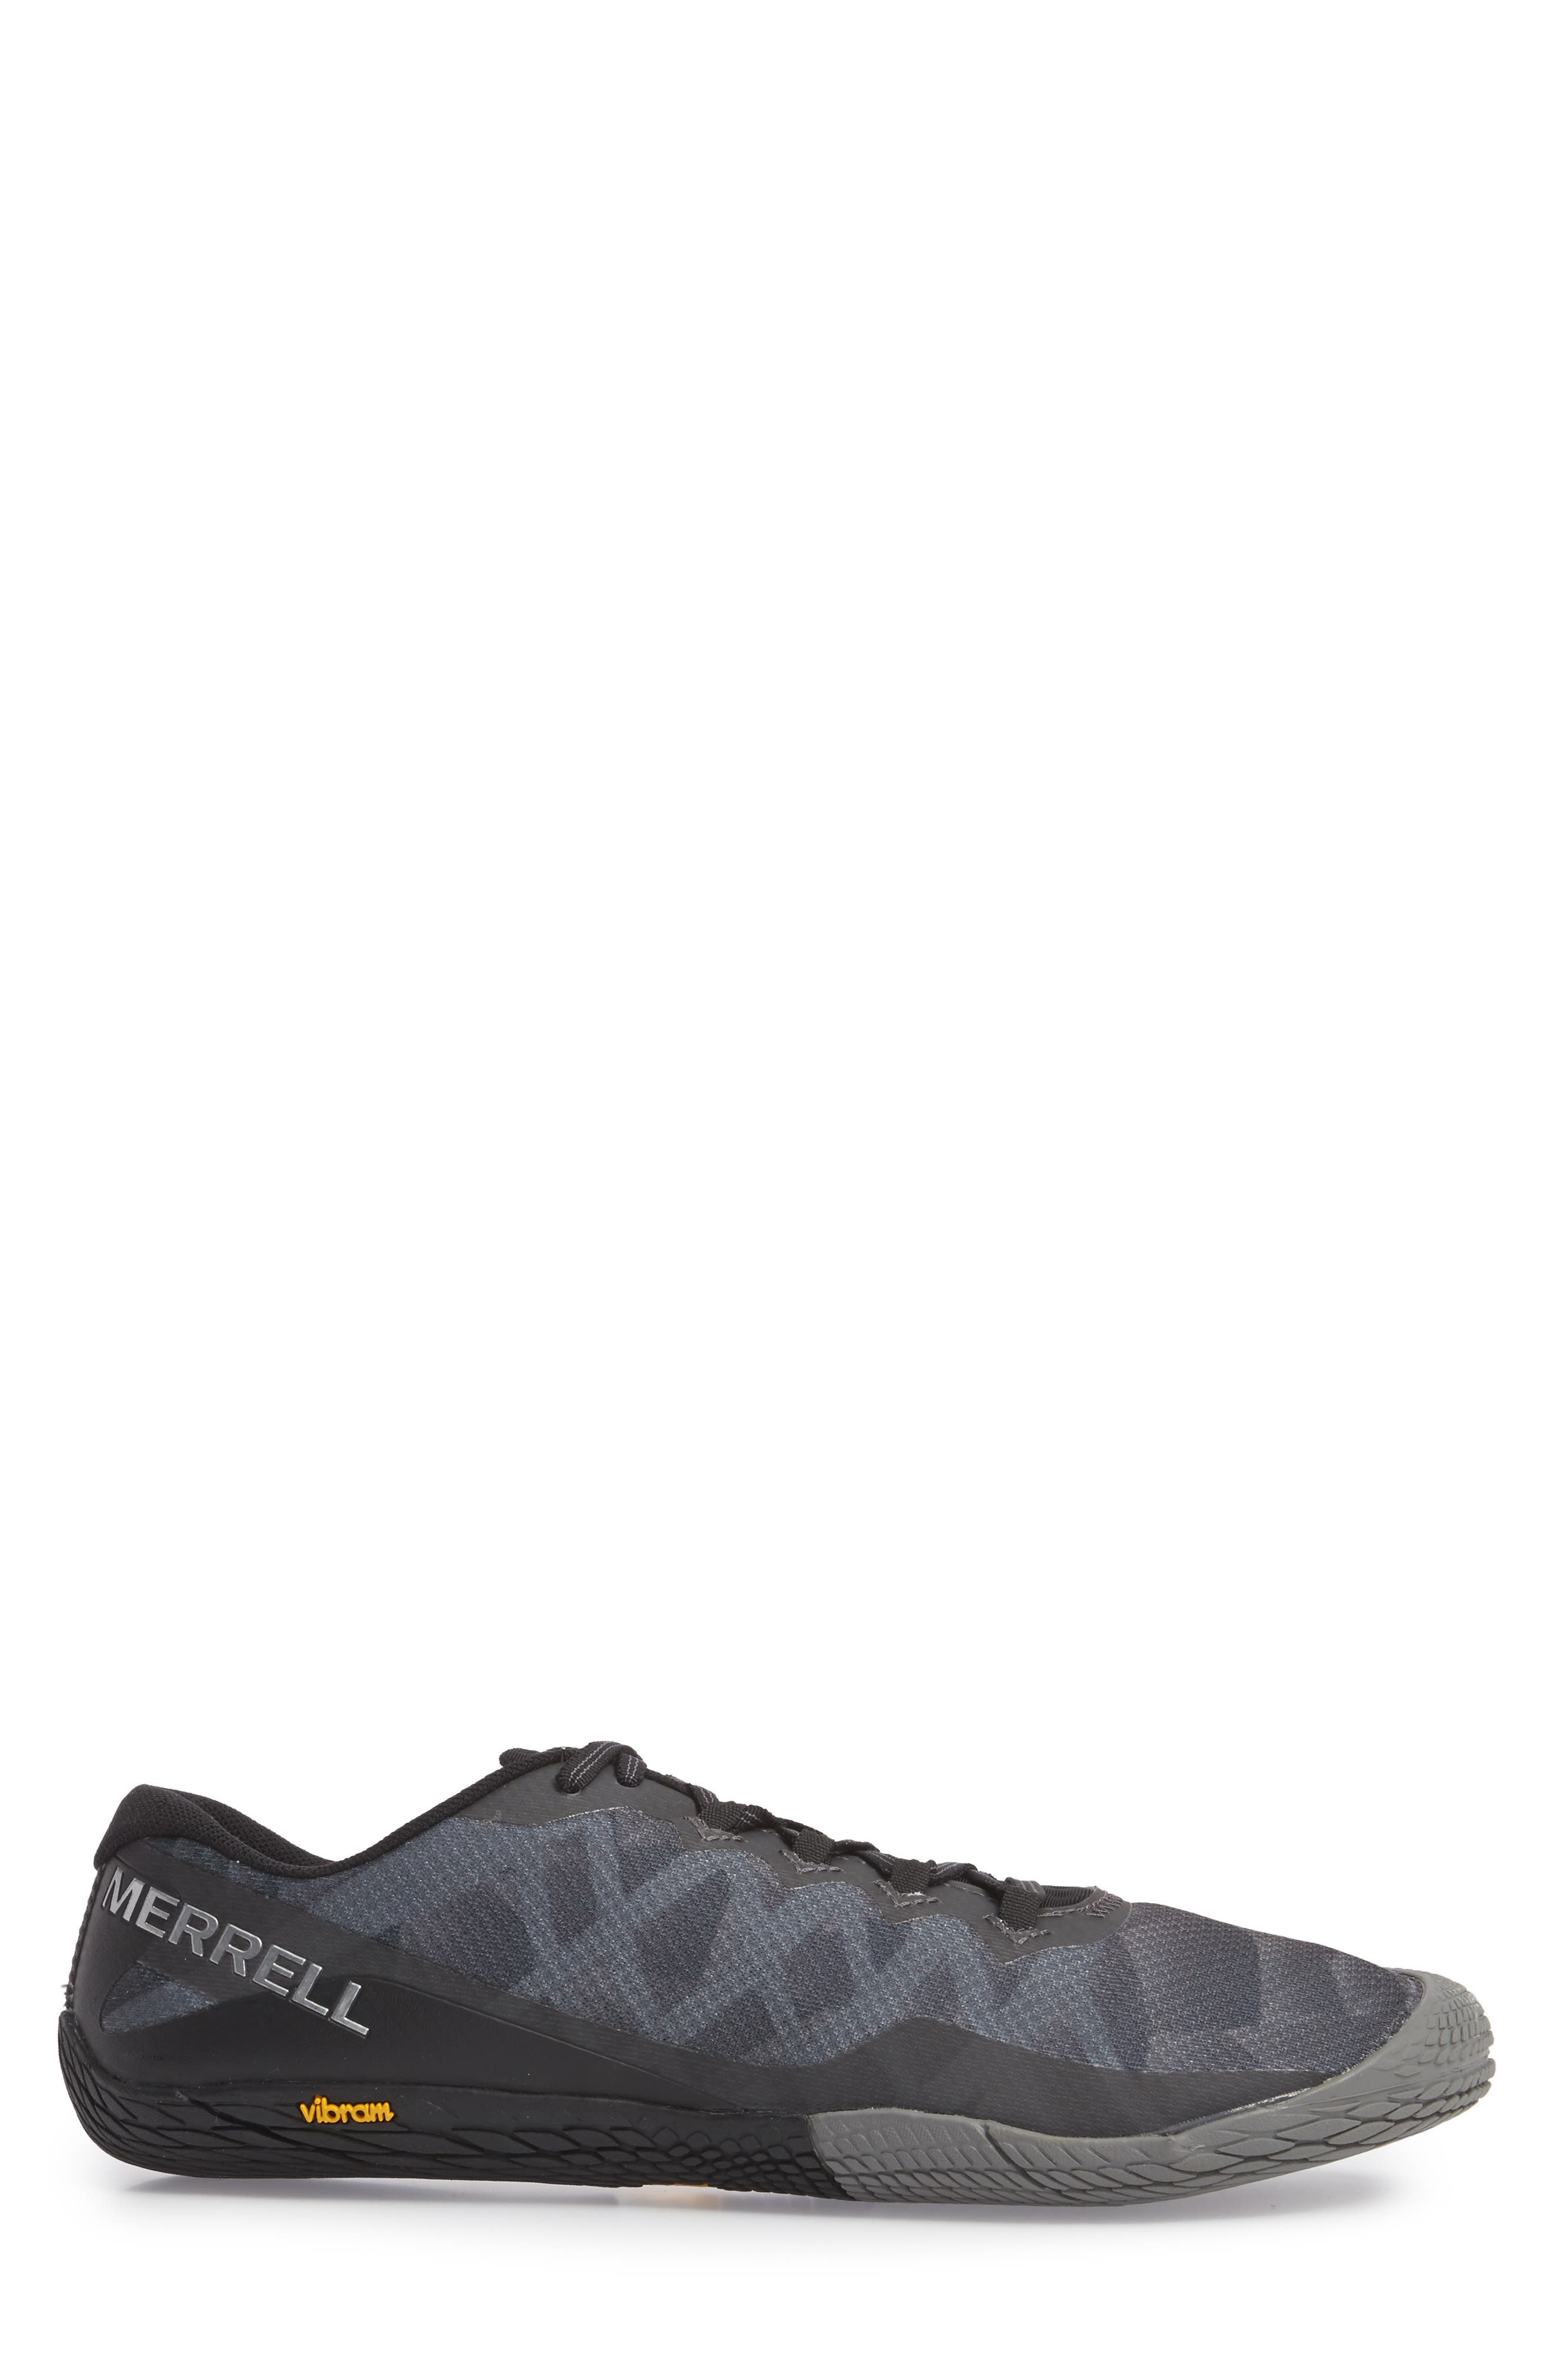 Vapor Glove 3 Trail Running Shoe,                             Alternate thumbnail 3, color,                             BLACK/ SILVER